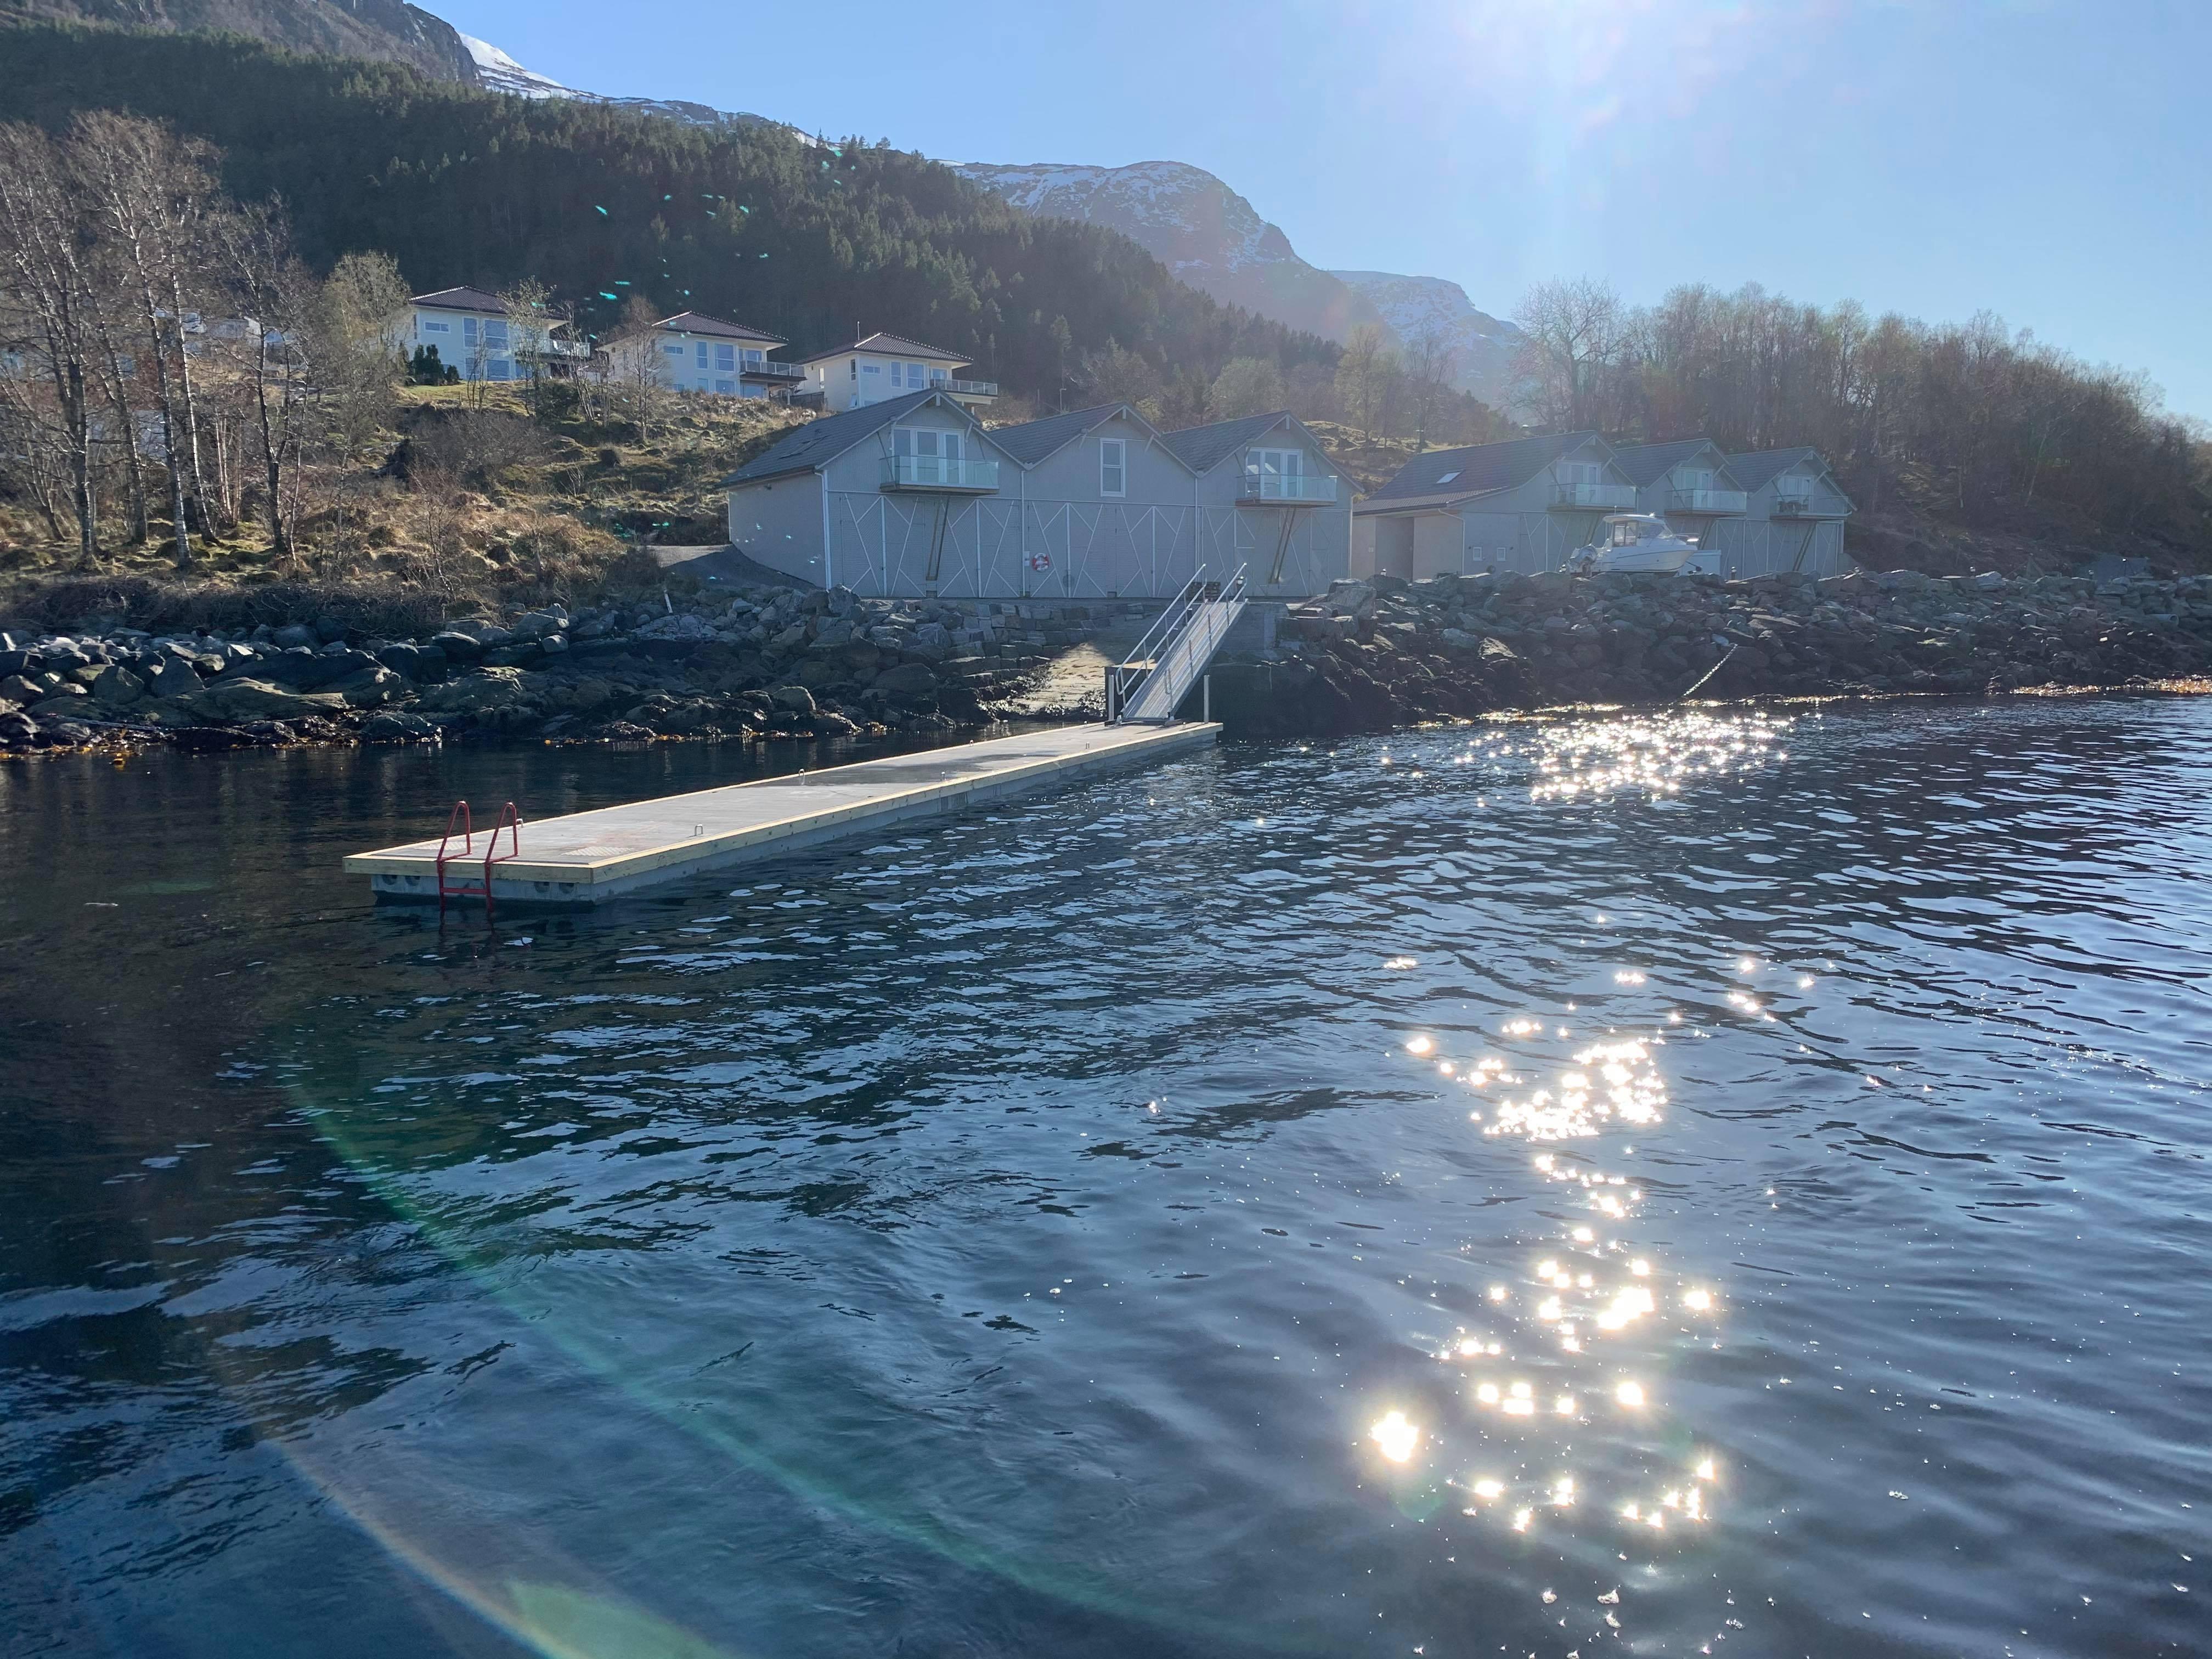 https://marinasolutions.no/uploads/Sletta-Byggelag-2020-6.jpg